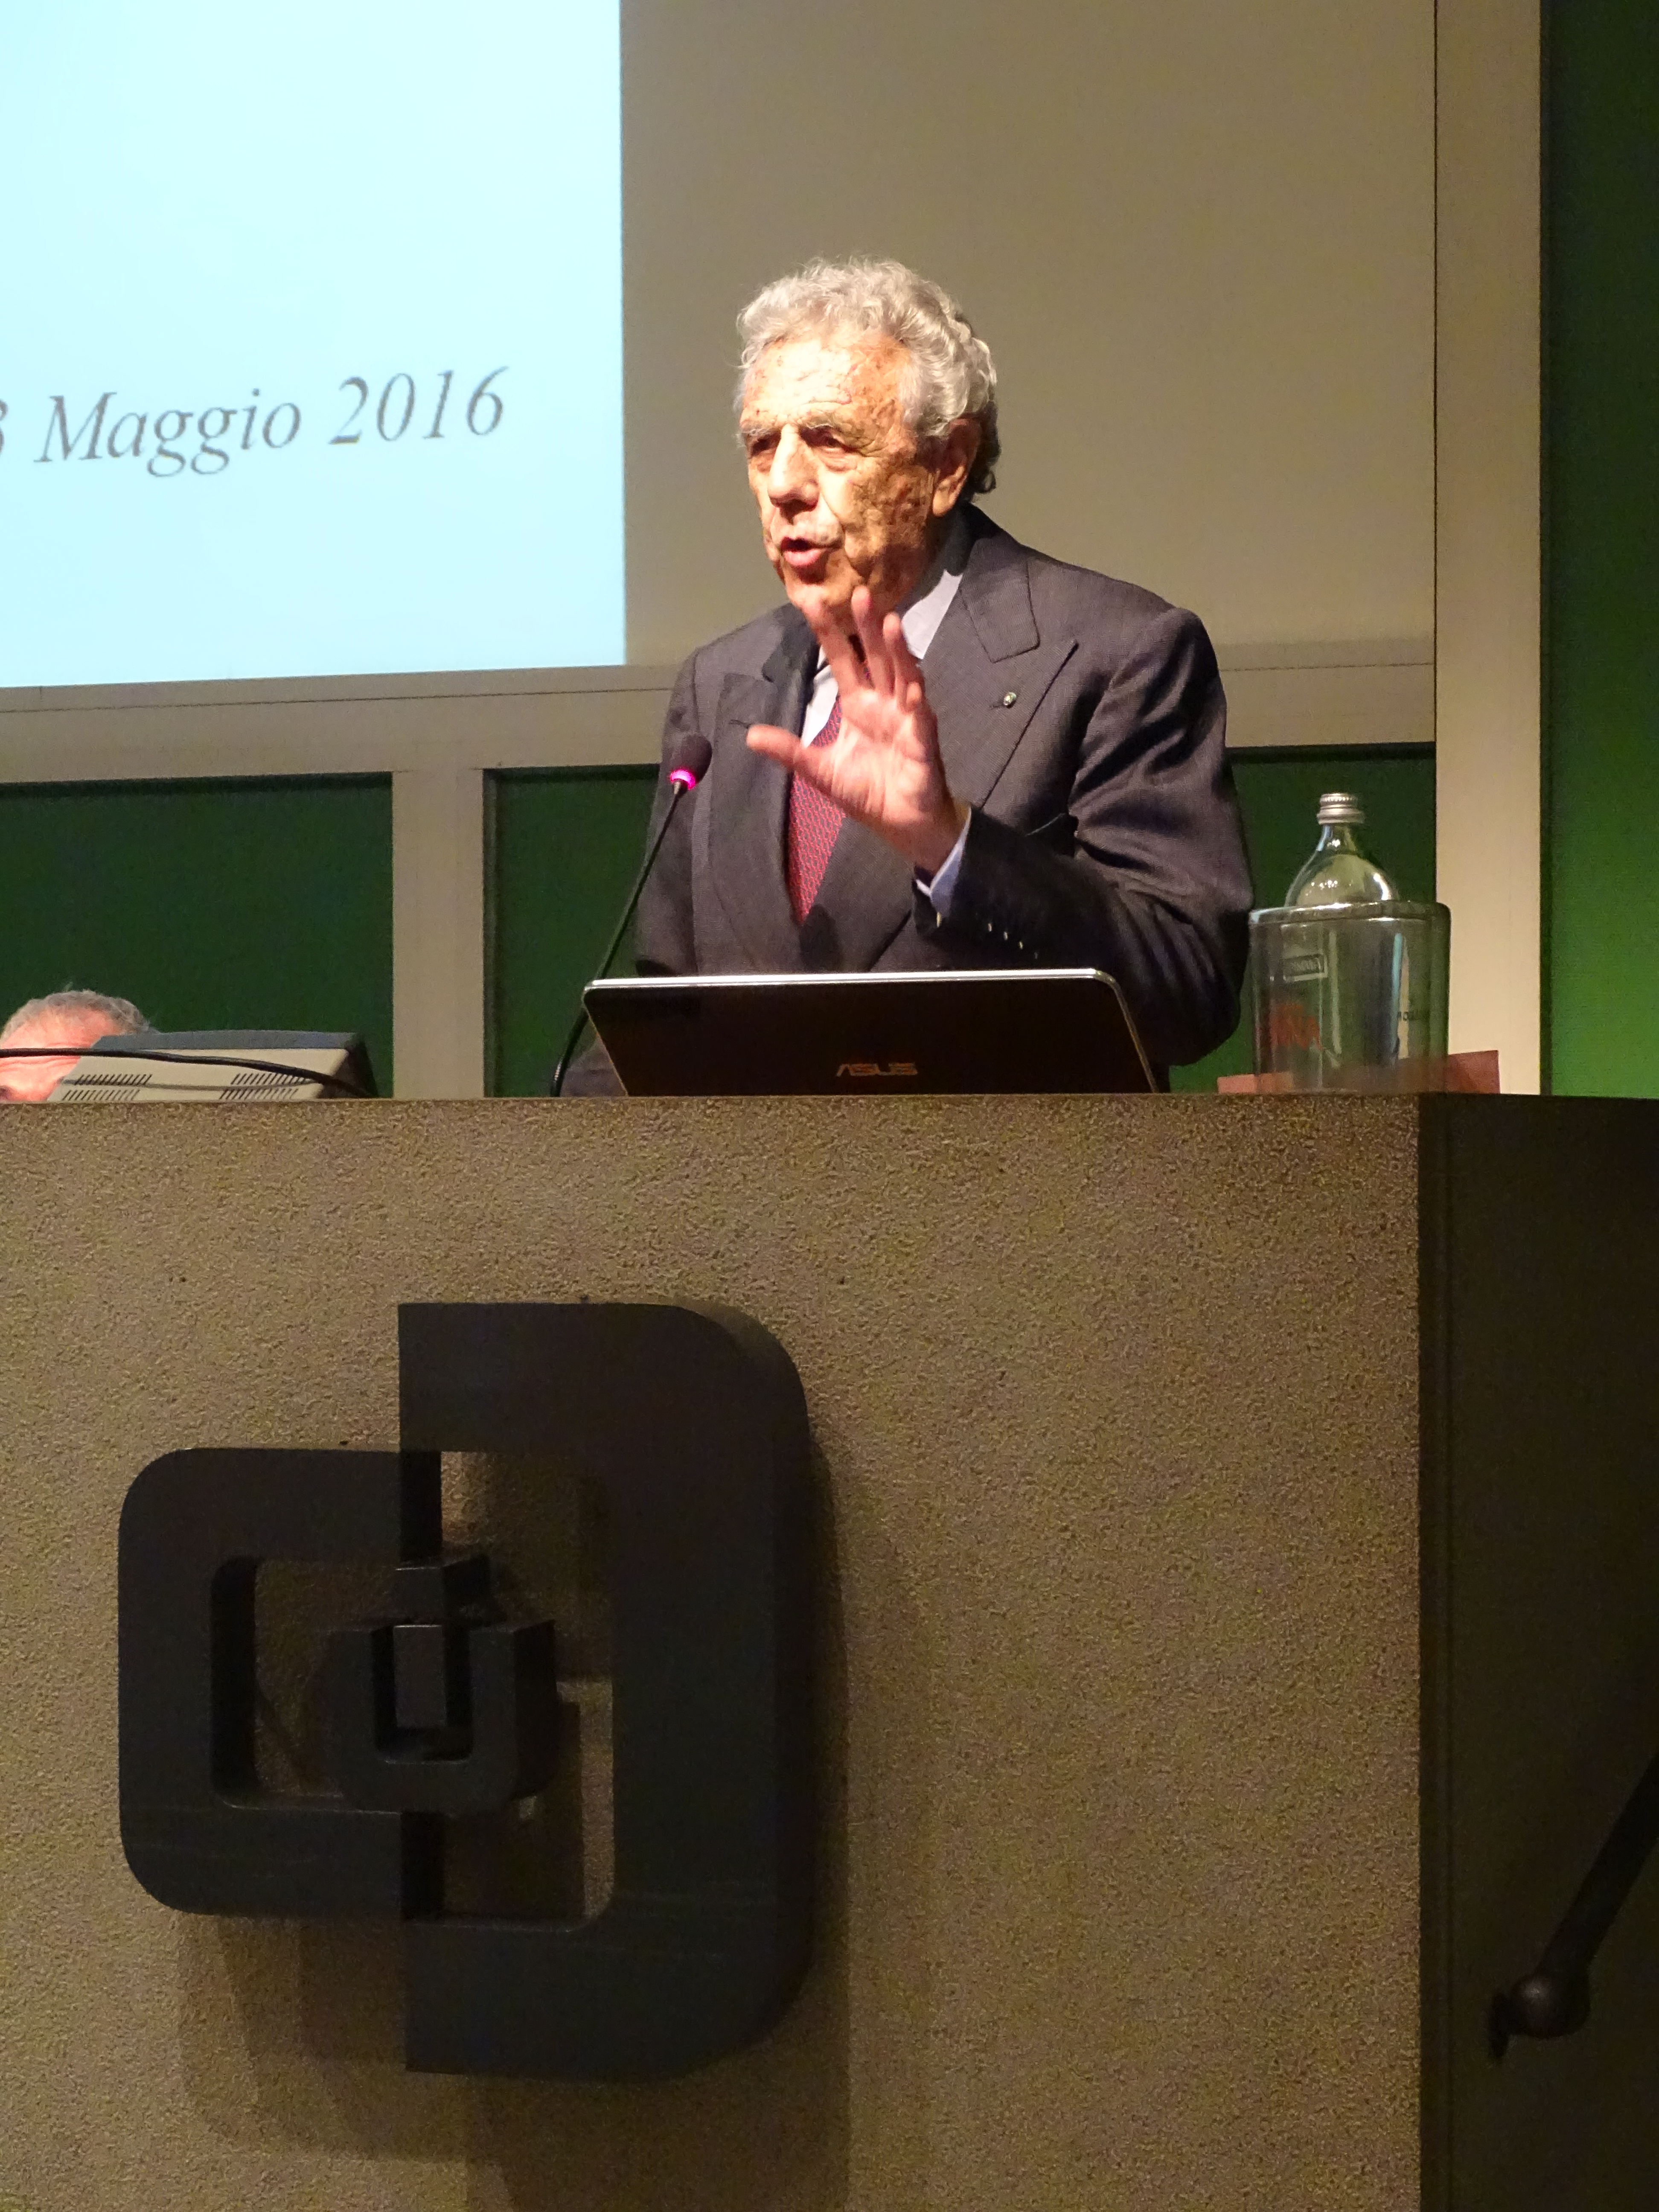 Cav. Lav. Giovanni Novi